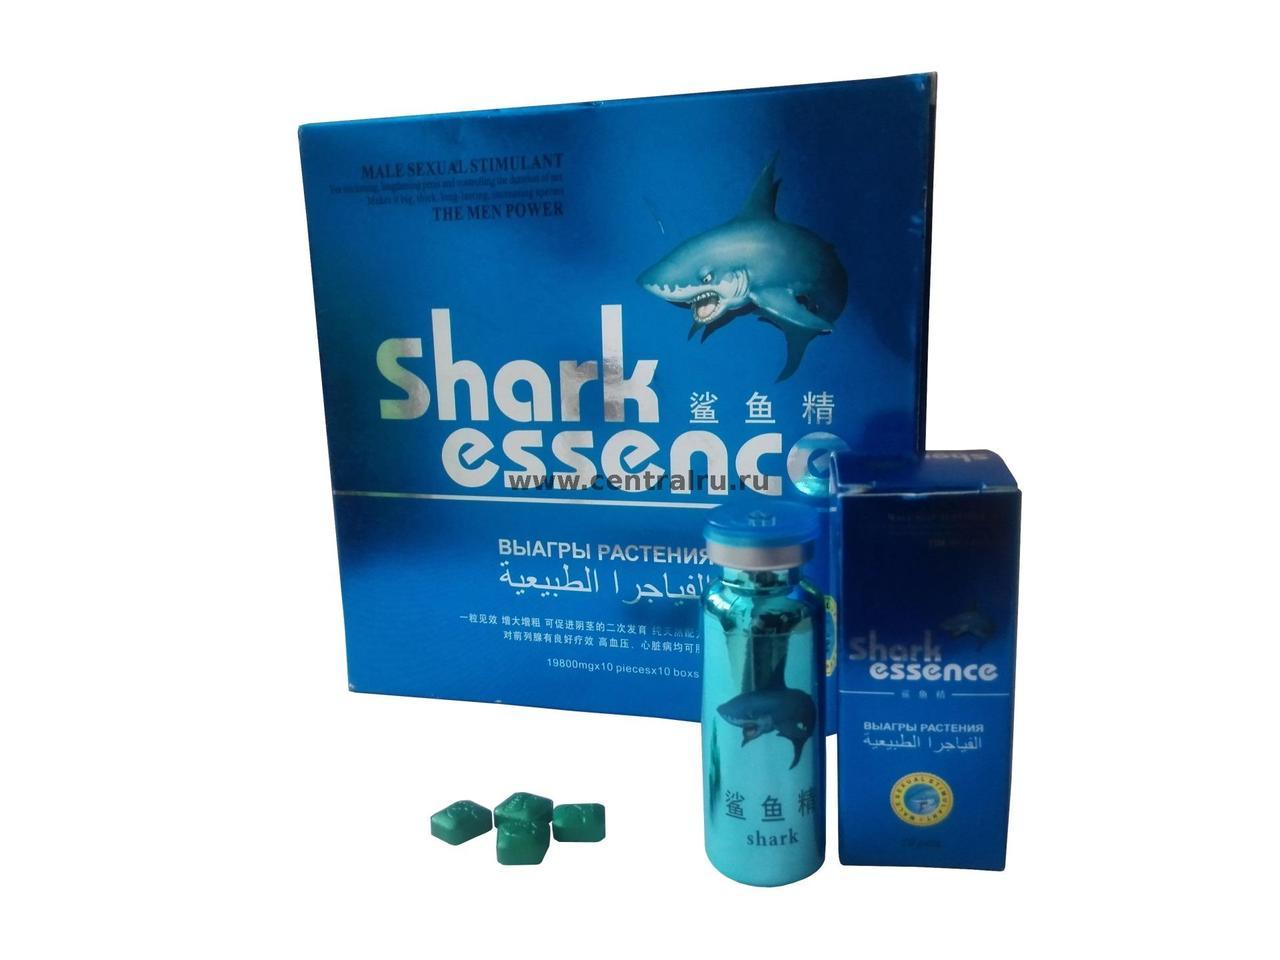 Таблетки для повышения потенции Shark Essence / Акулья Эссенция (10 таблеток)